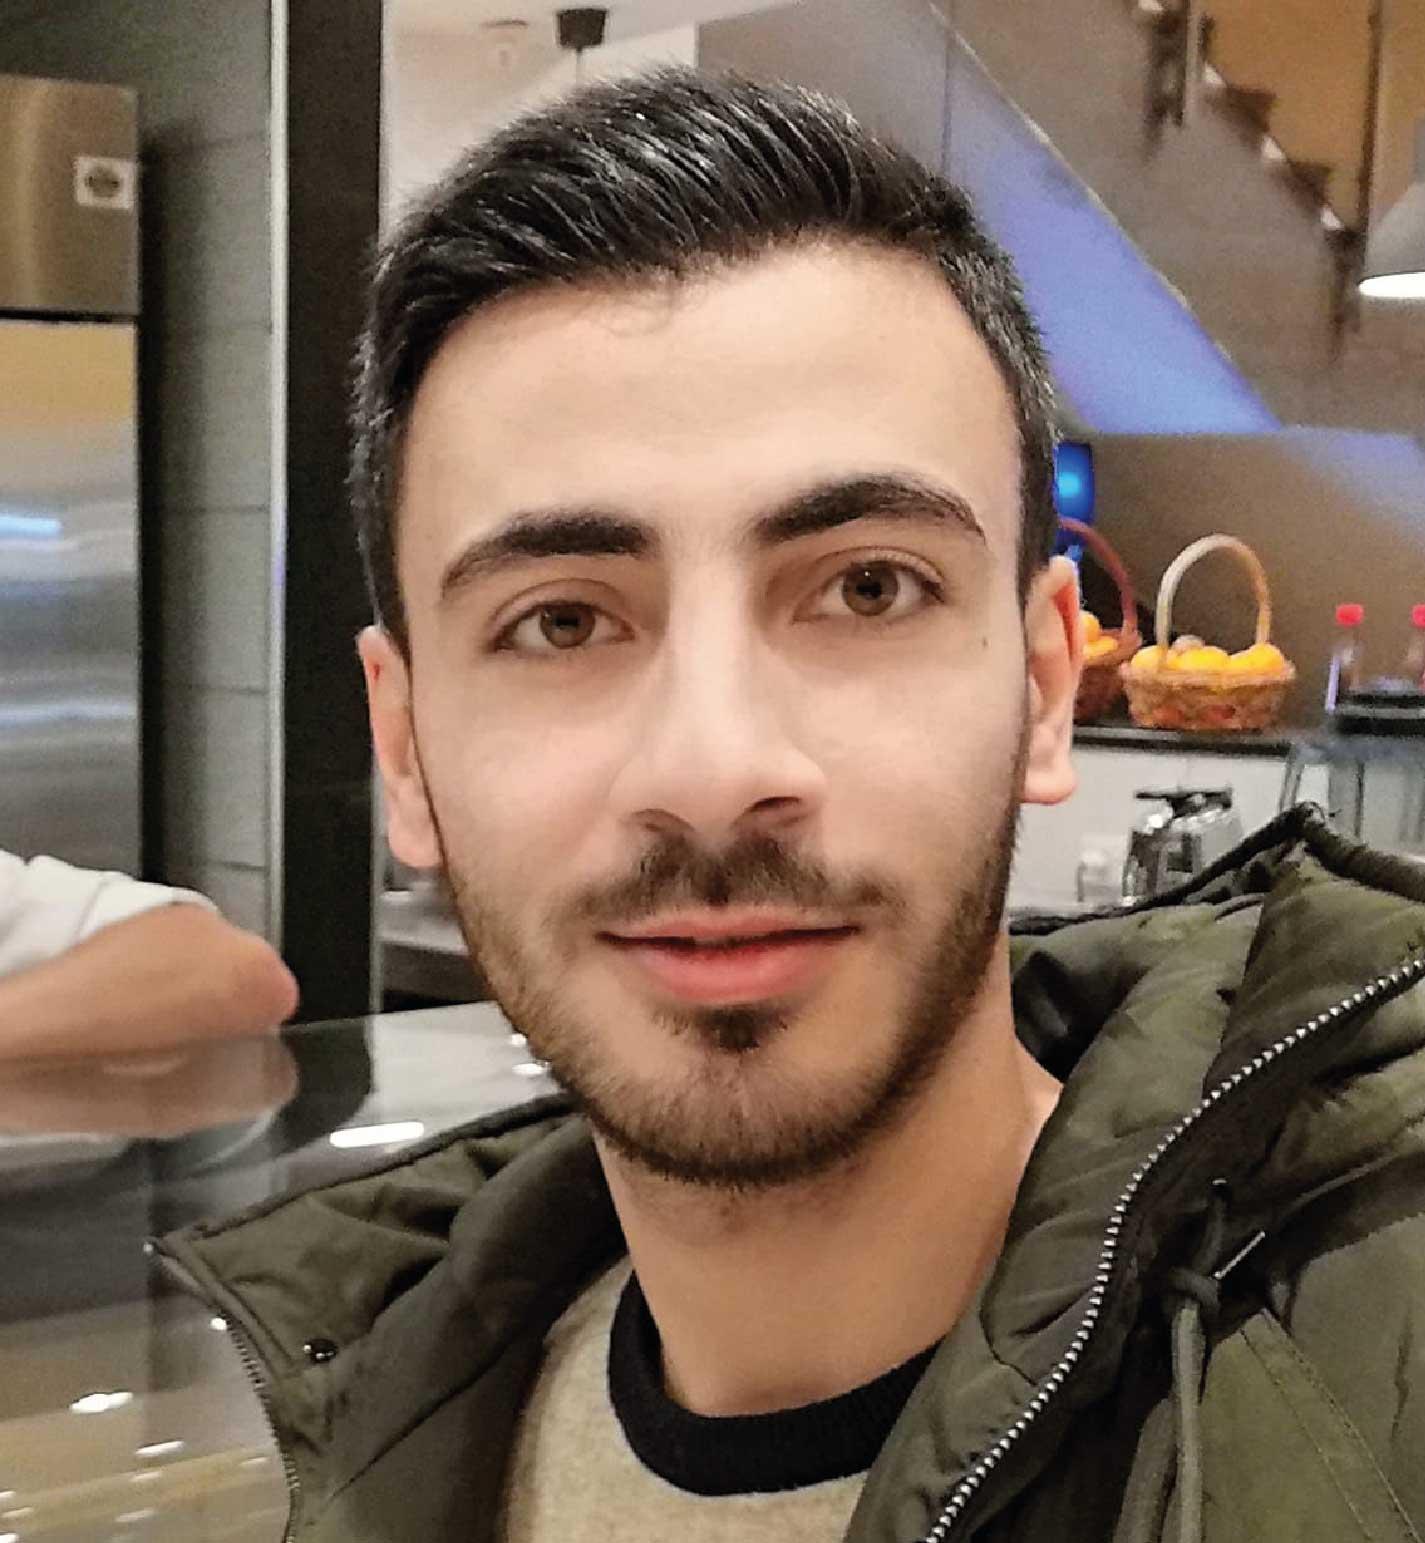 Eng. Amjad Albayoumi